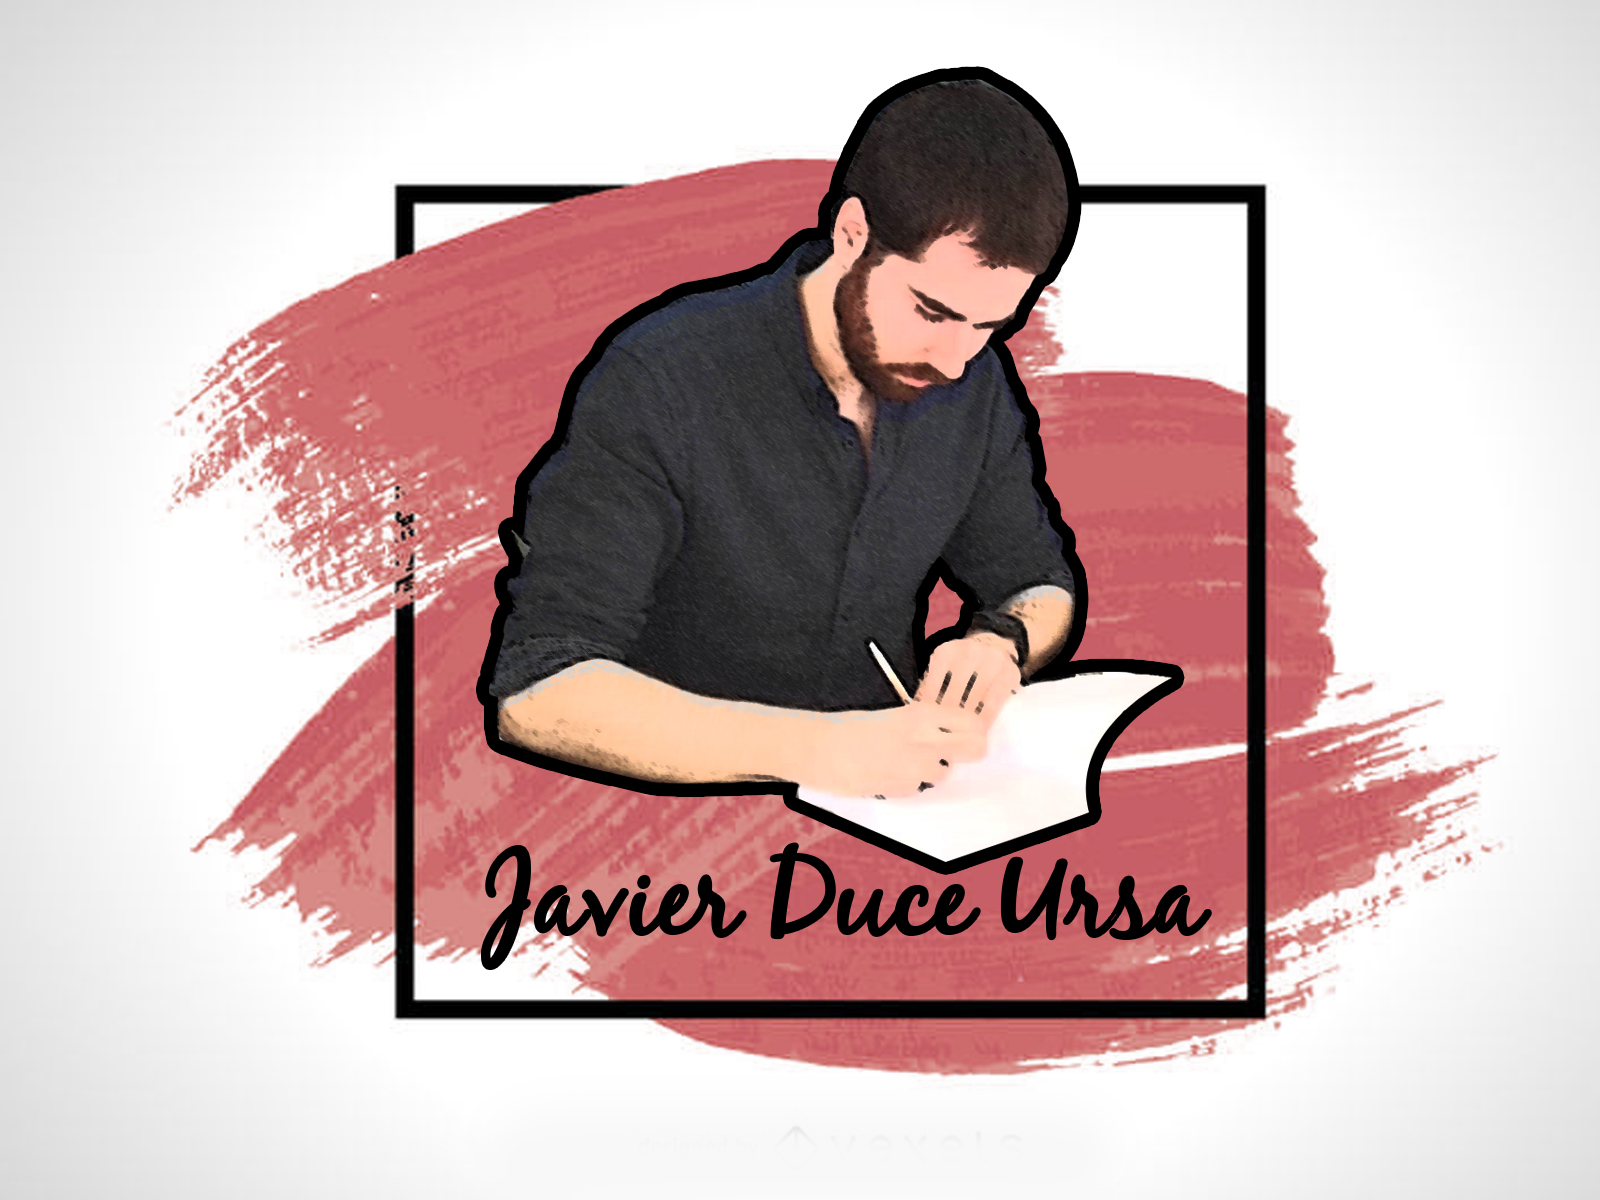 Javier Duce Ursa